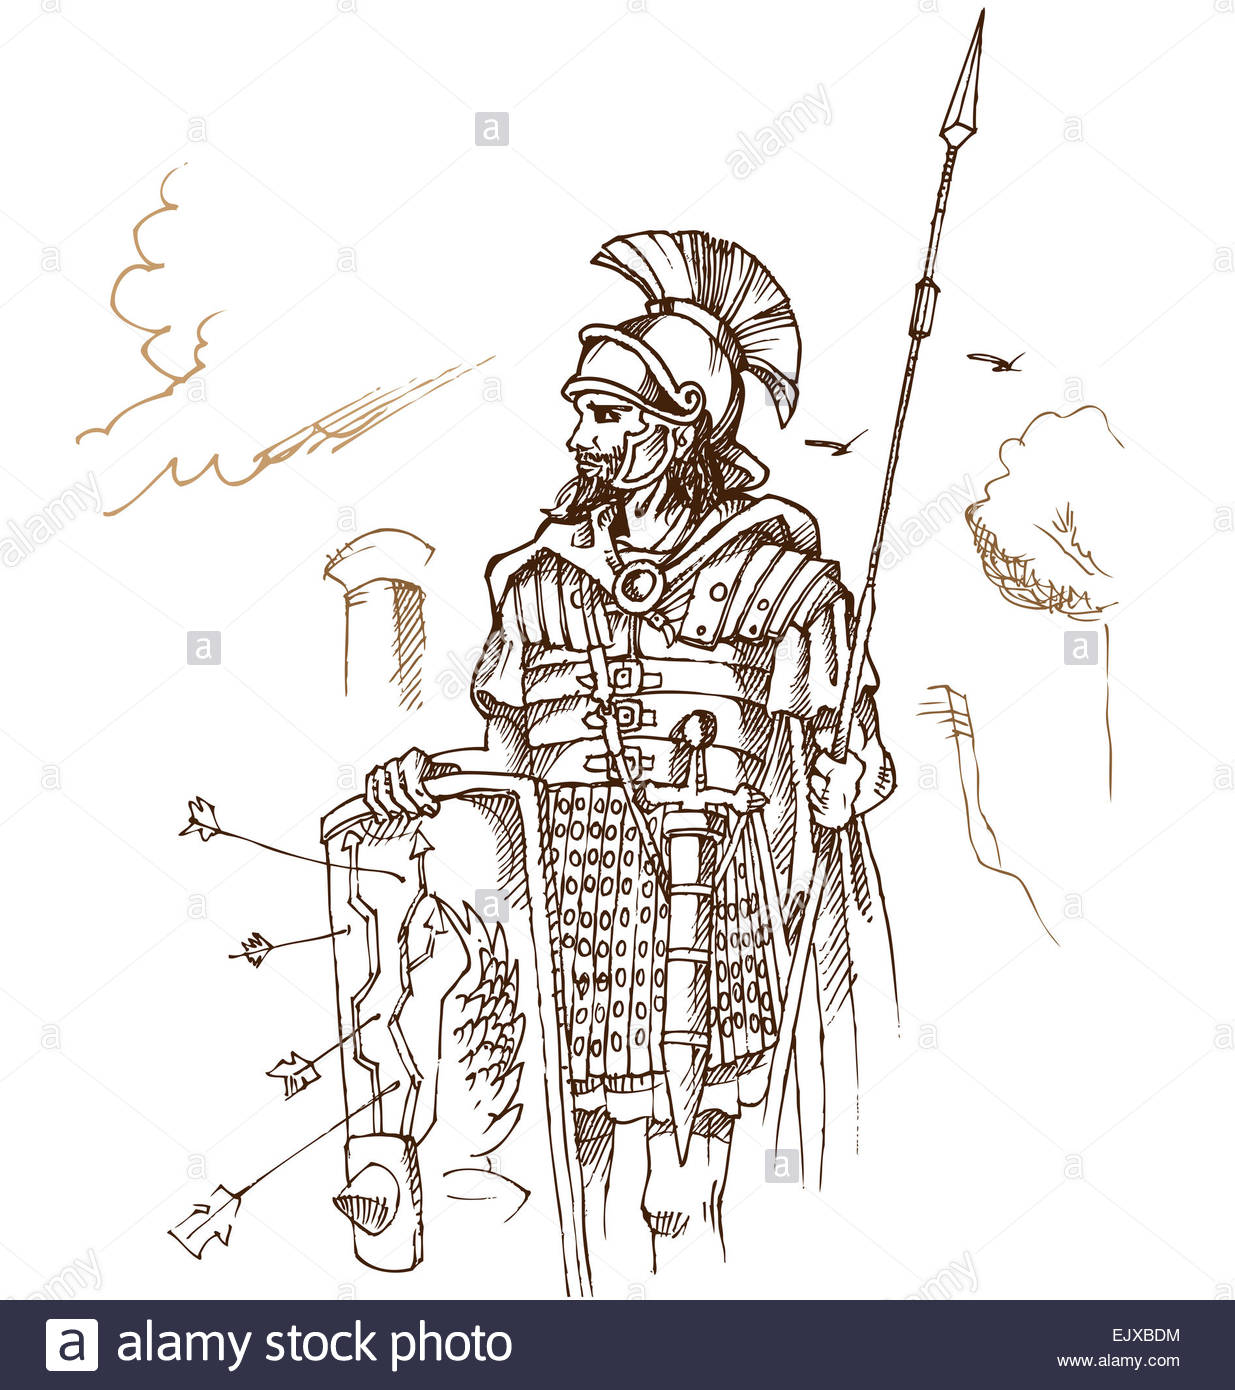 1235x1390 Roman Warrior Hand Draw On Background Stock Photo, Royalty Free